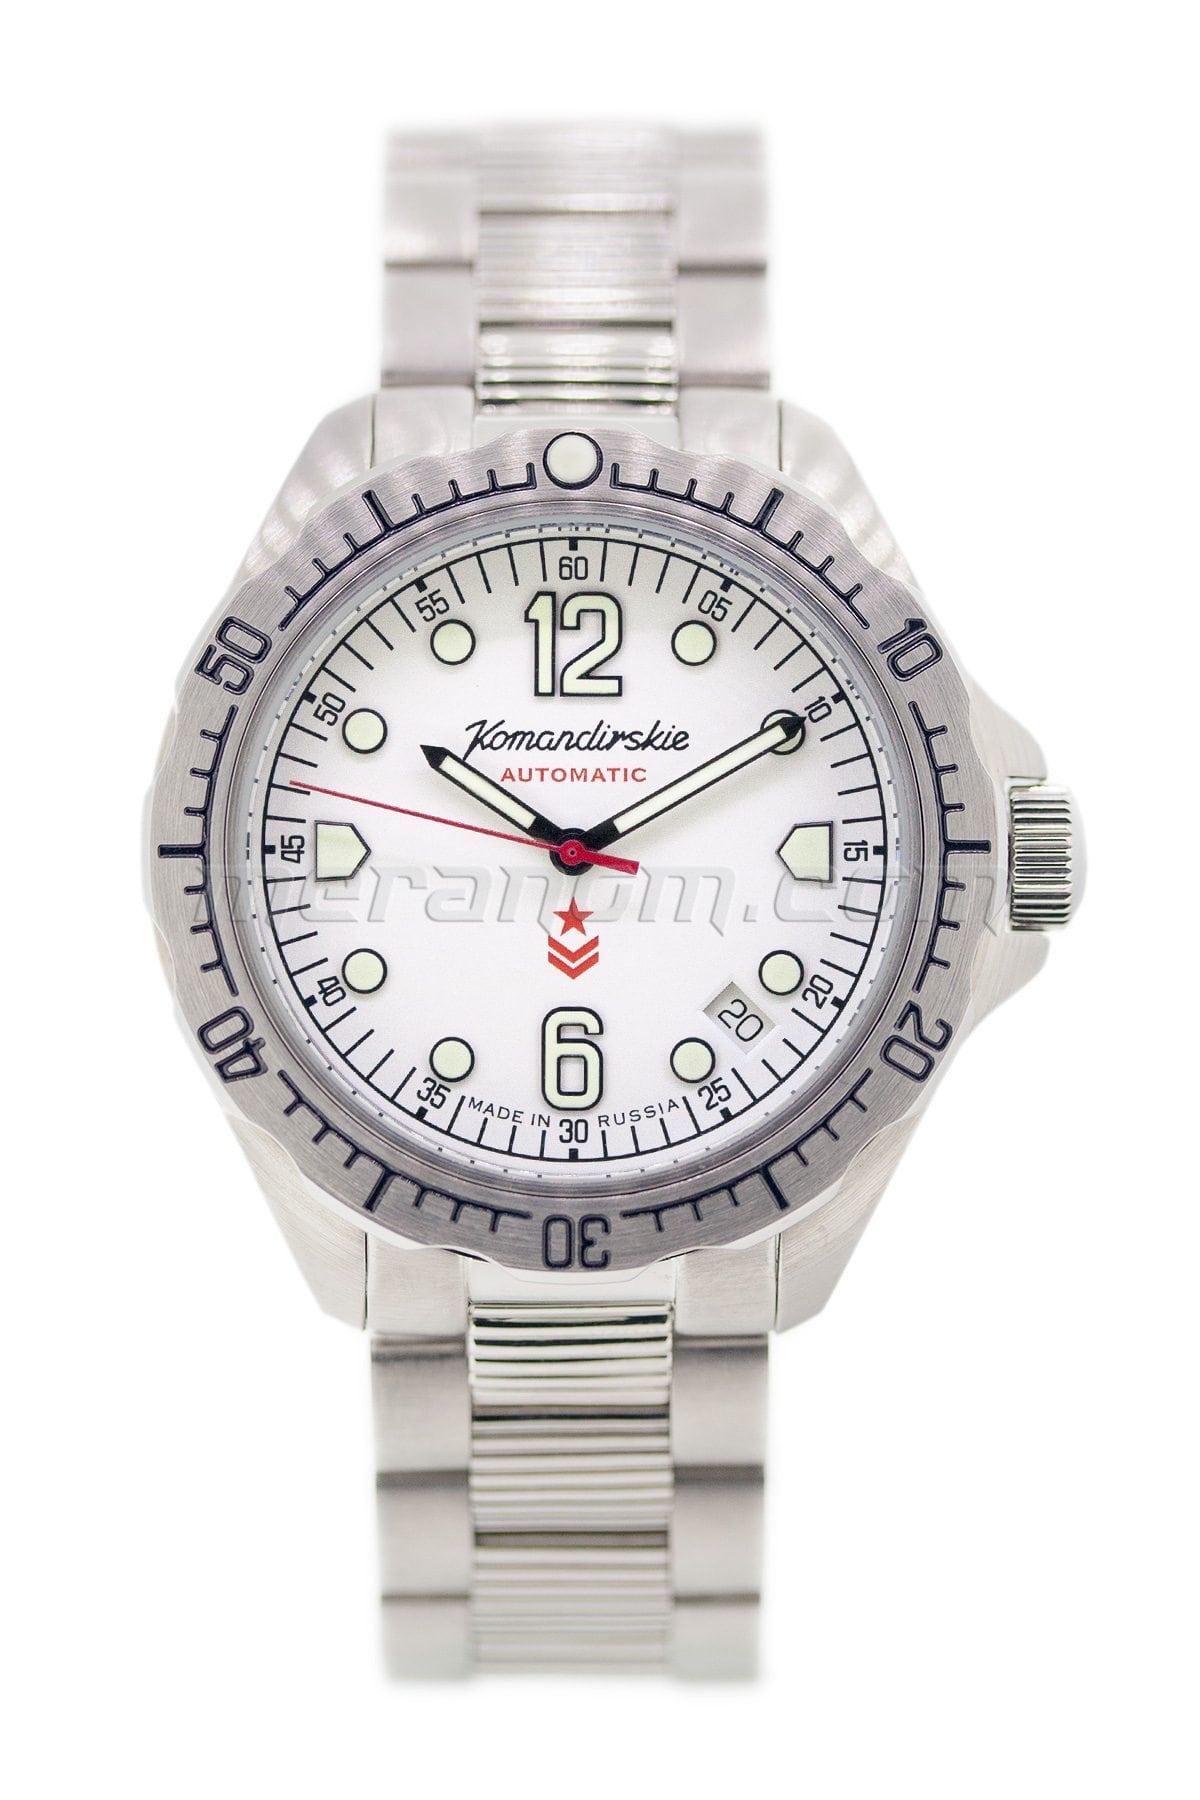 Vostok watch komandirskie k 34 2416b 480768 buy from an authorized dealer for Komandirskie watches